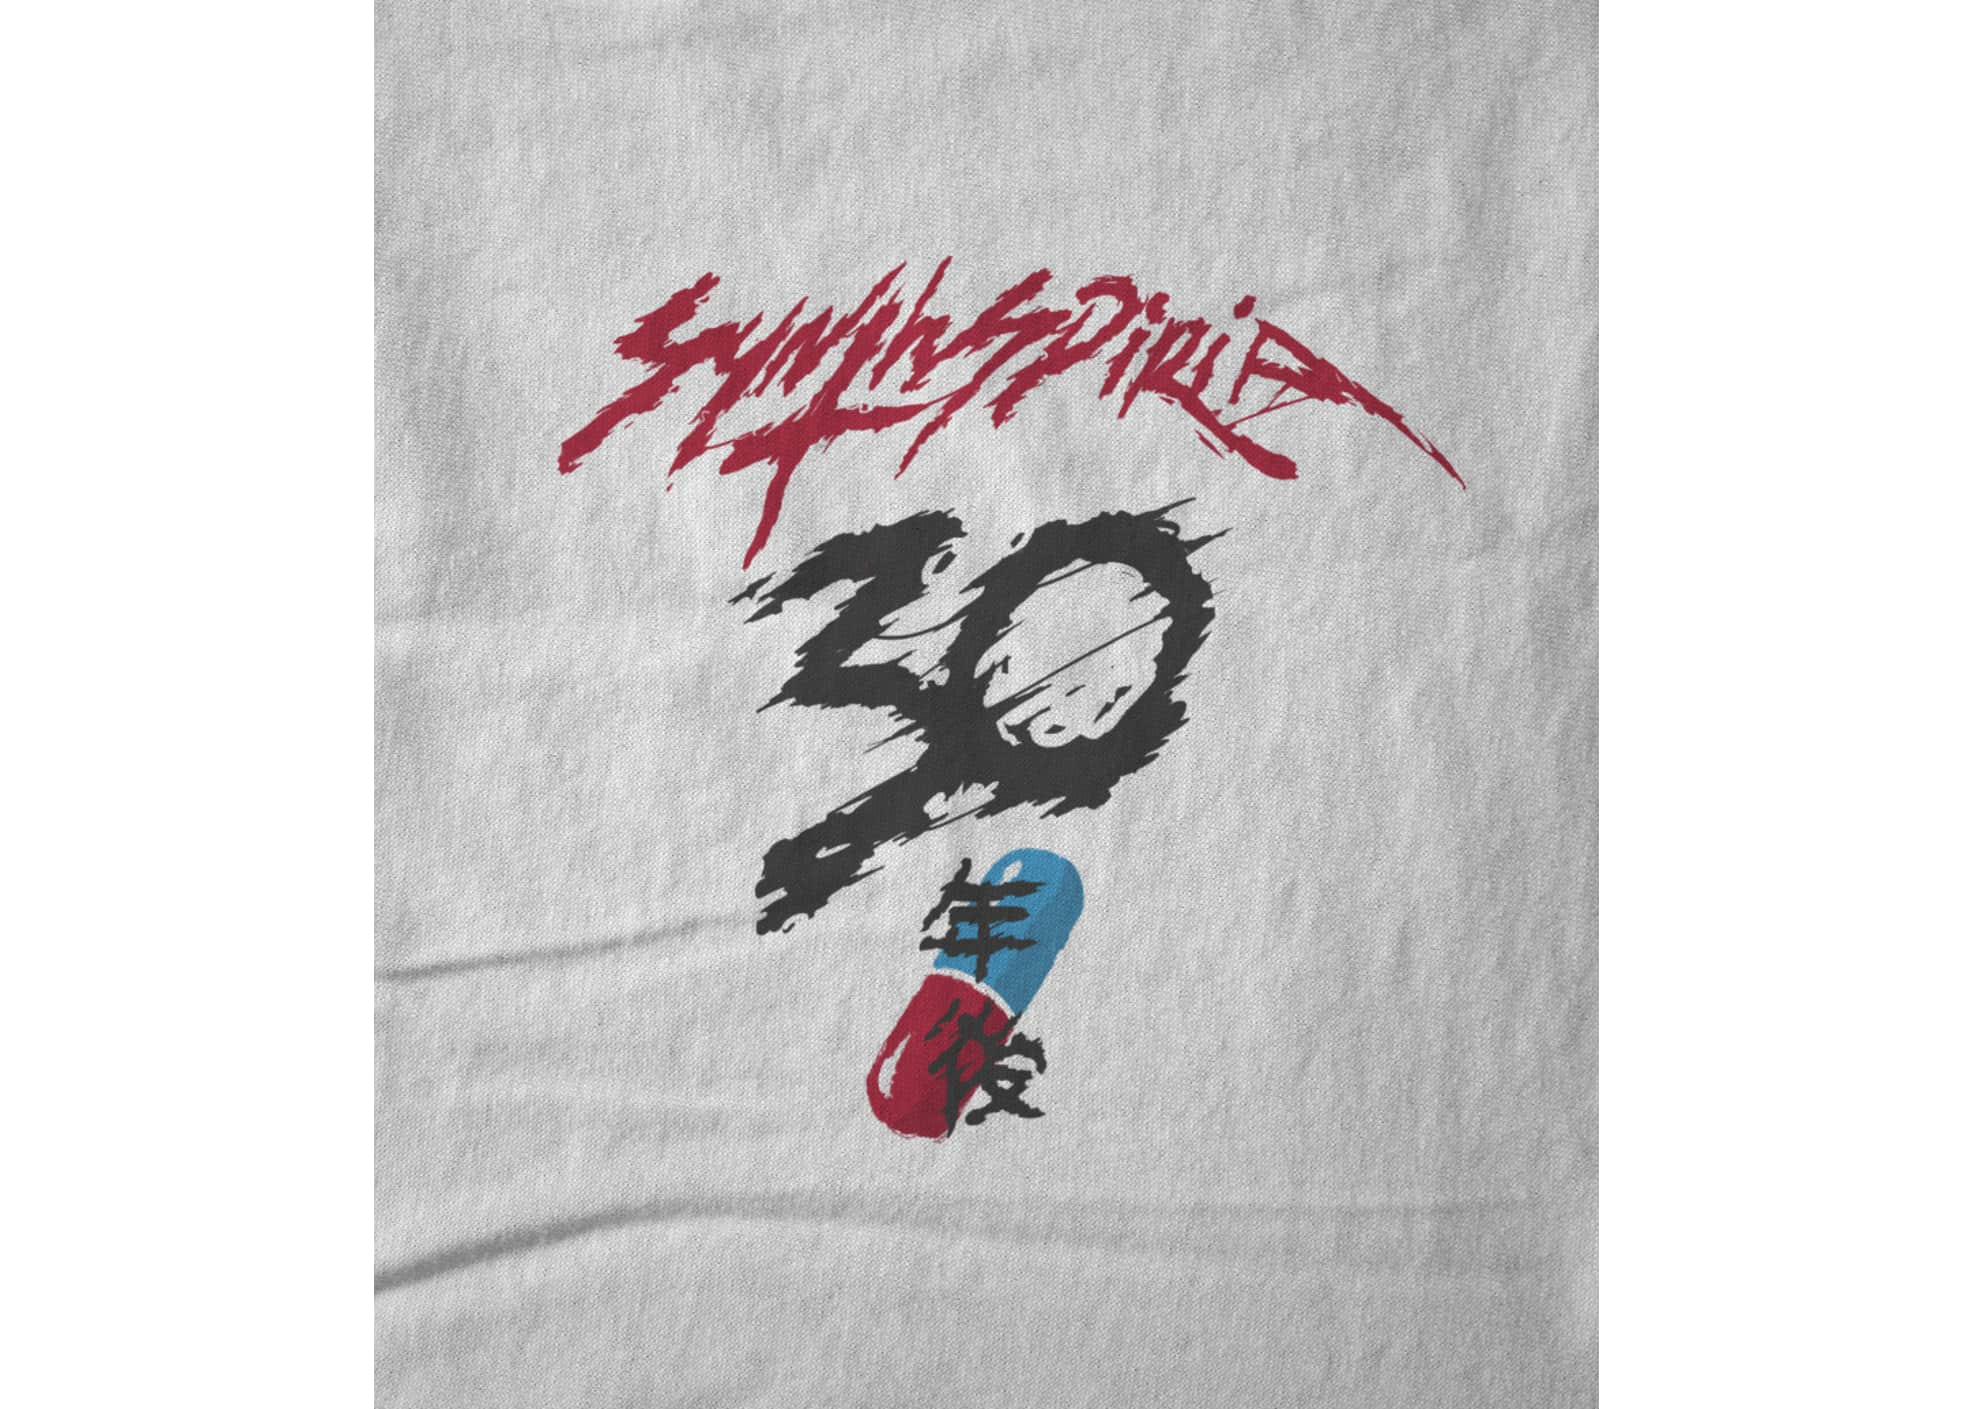 Synthspiria 30 years later   pill 1591034732